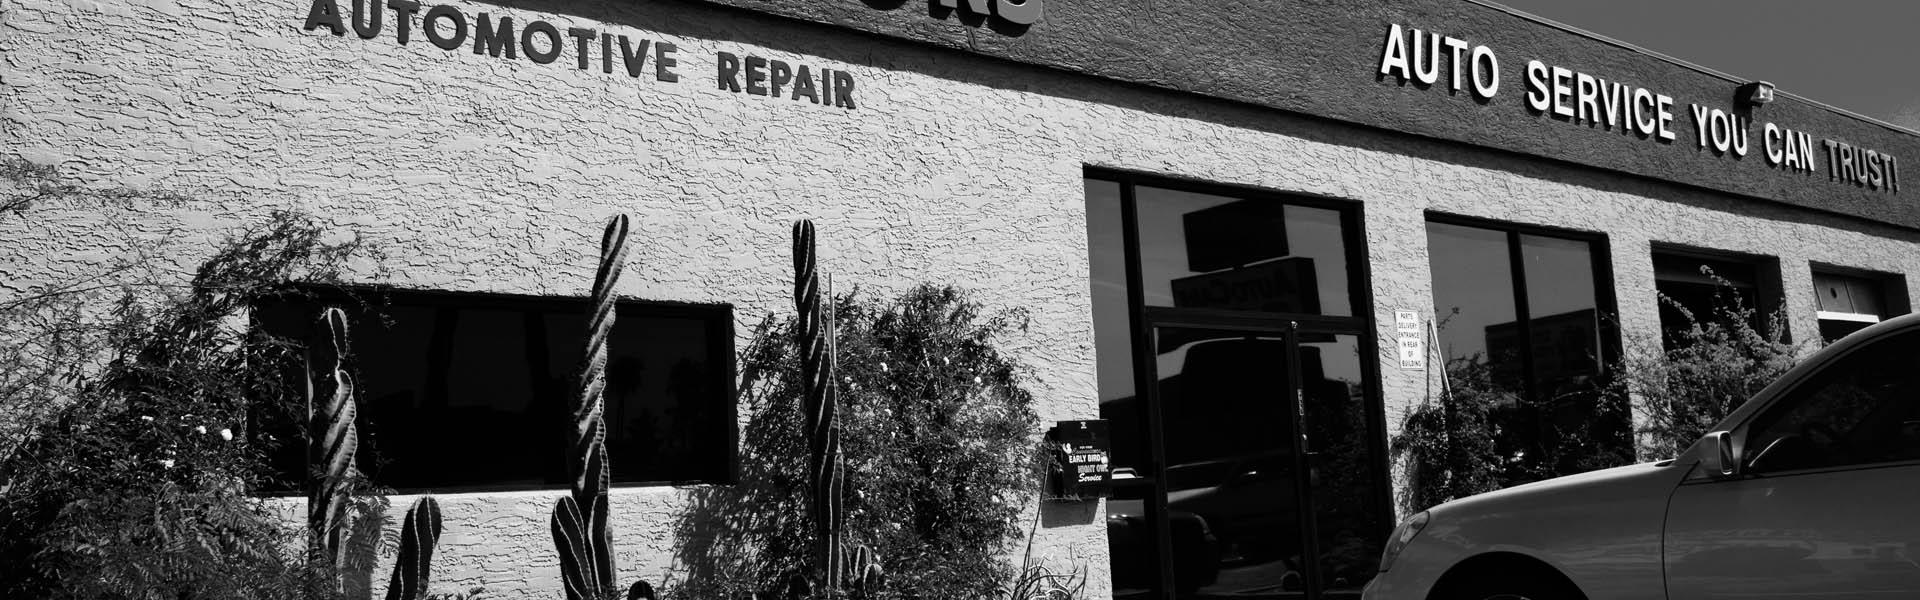 automotive-repair